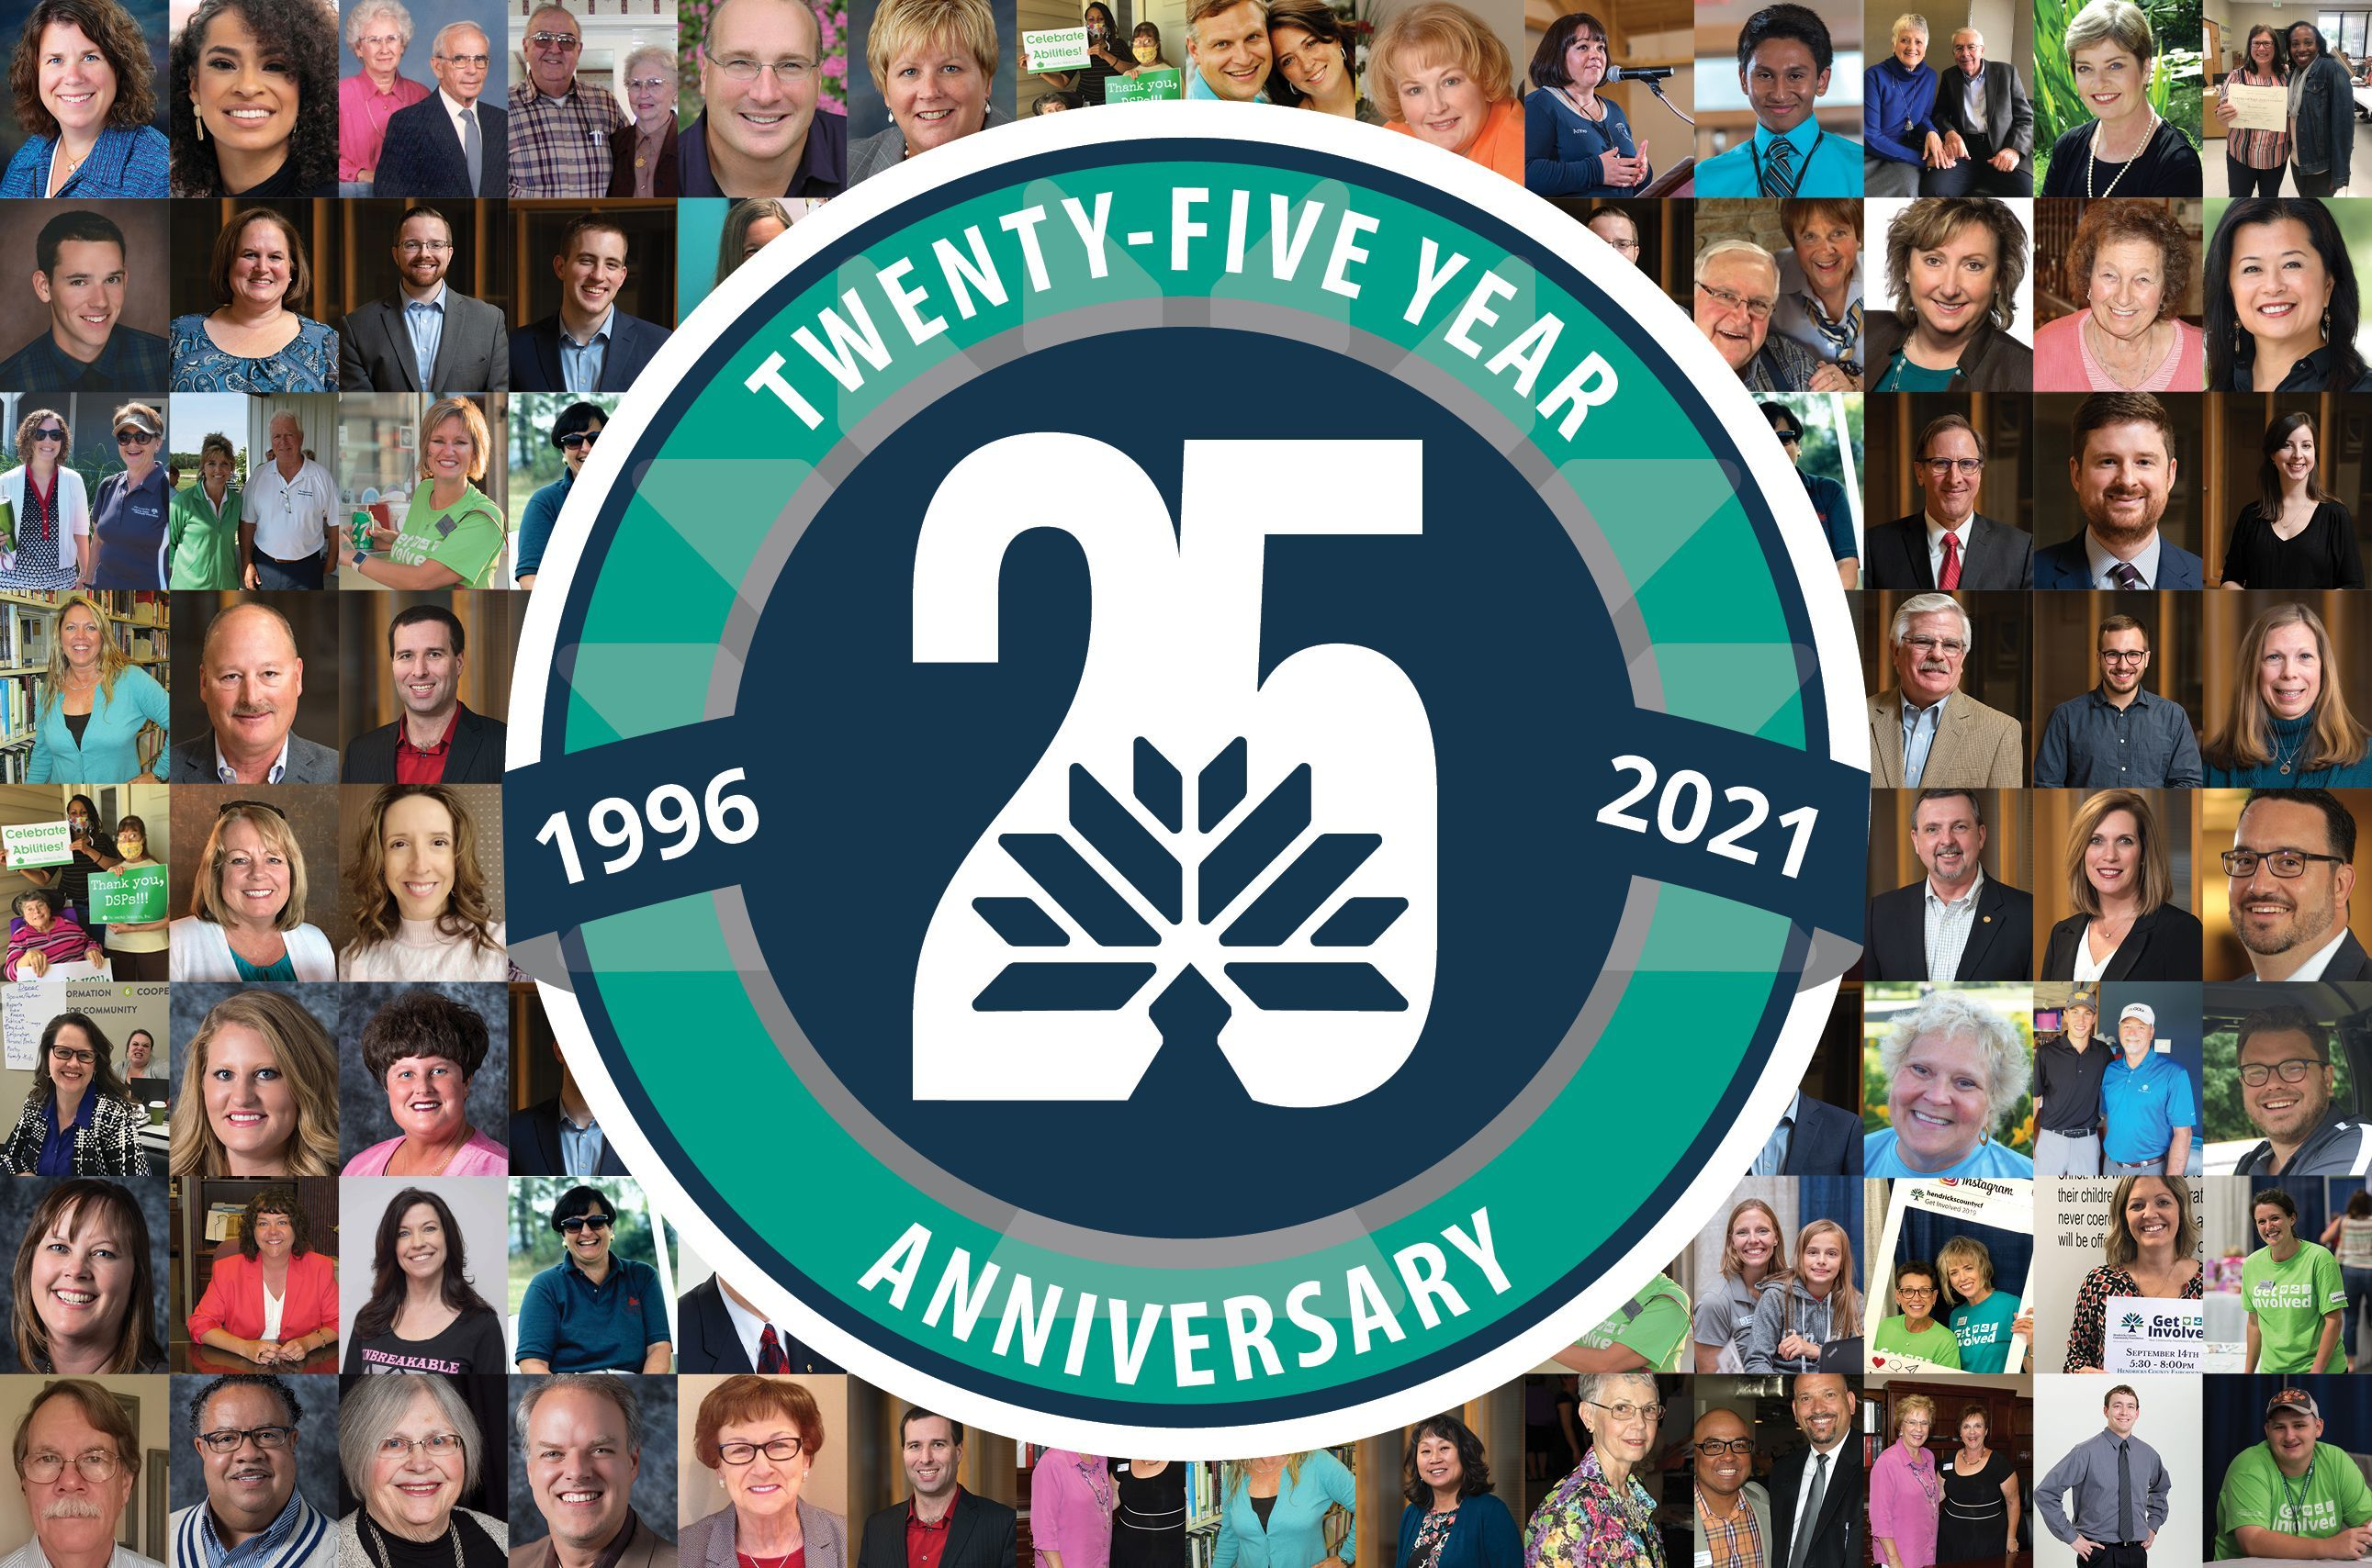 It's HCCF's 25th Anniversary!